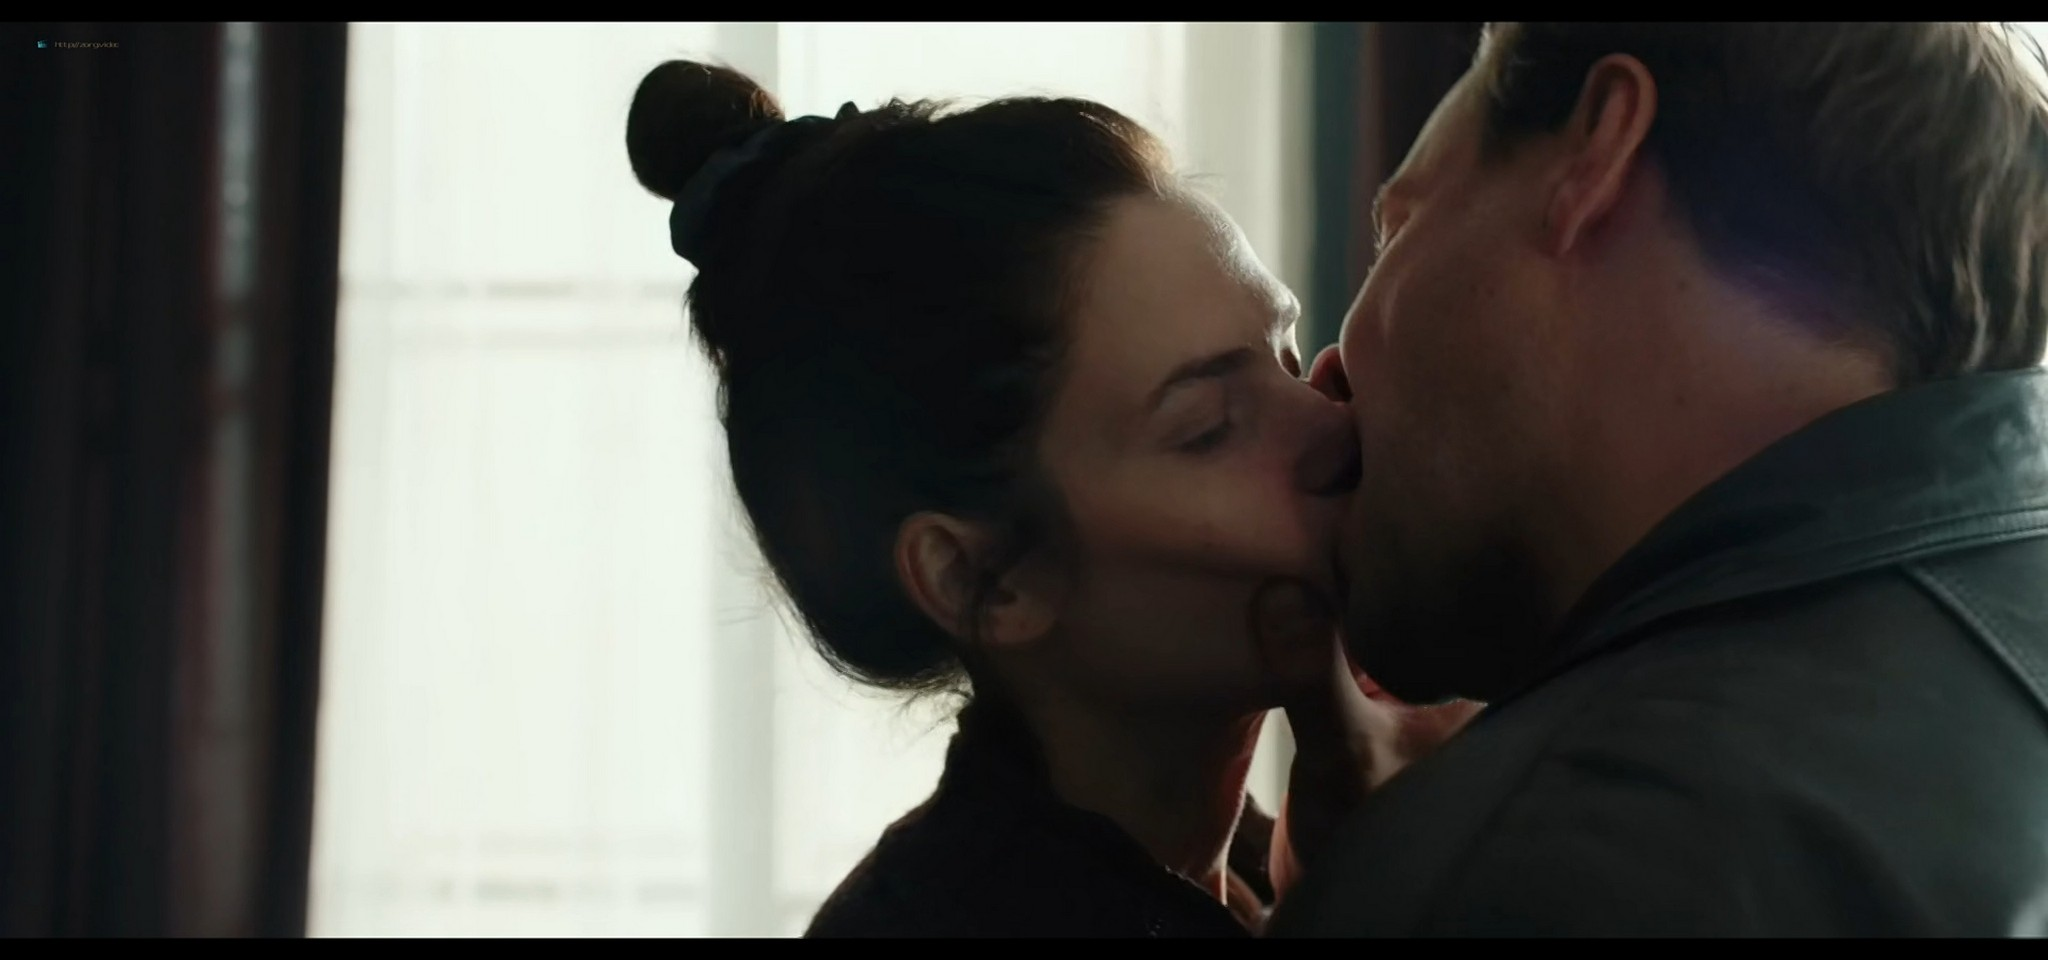 Yulia Snigir hot and some sex Anna Chipovskaya, Yuliya Peresild sexy - The End of the Season (2019) HD 1080p Web (9)